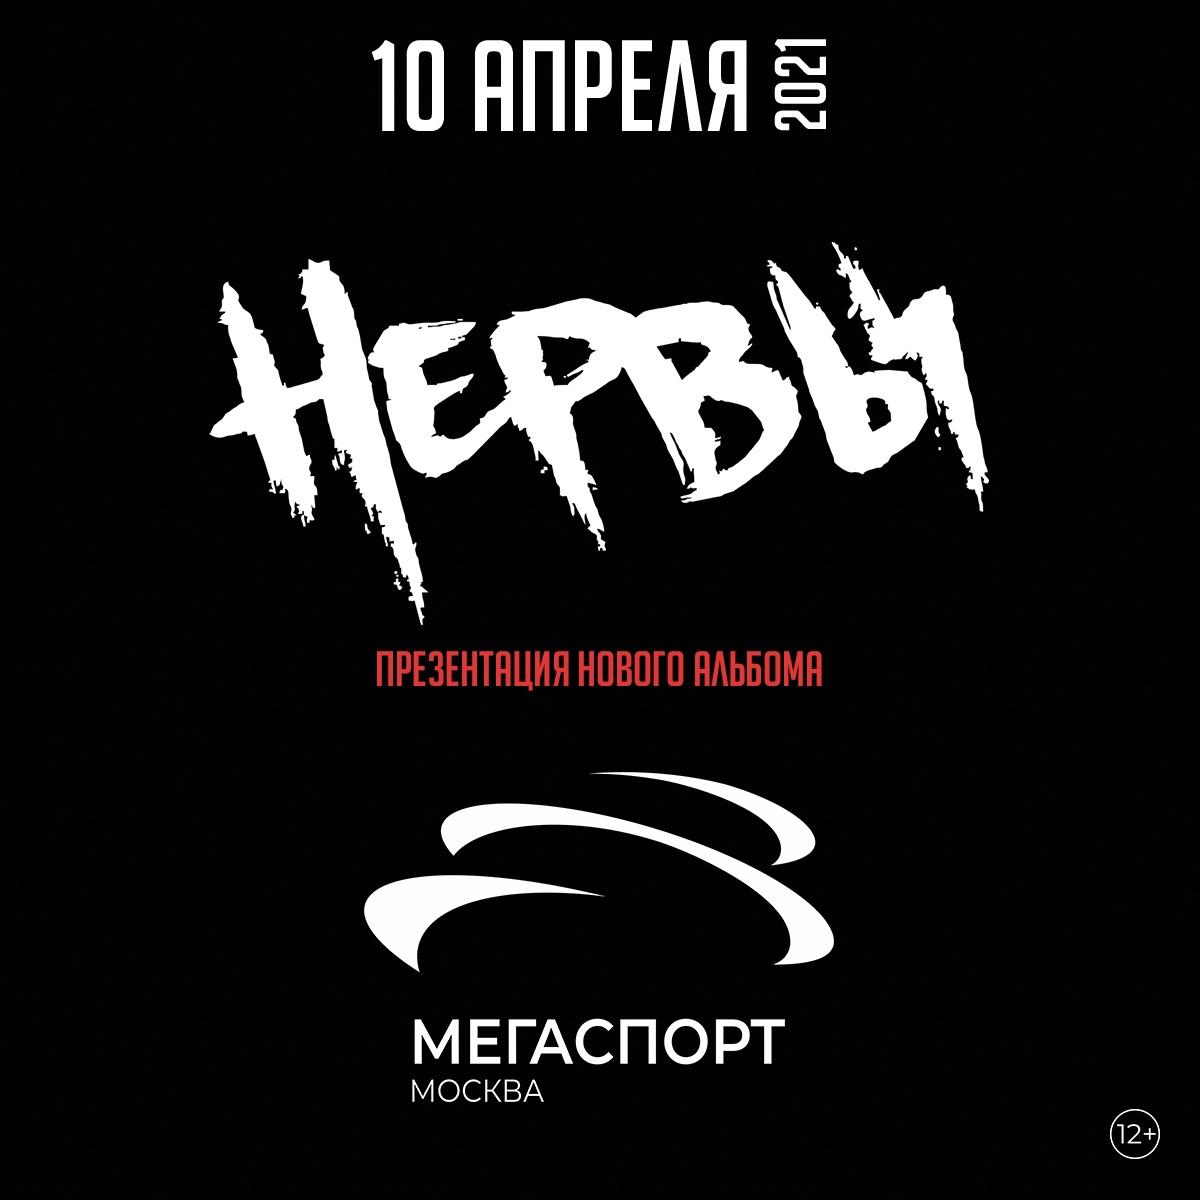 Афиша Москва НЕРВЫ / 10 апреля 2021 года/ МЕГАСПОРТ